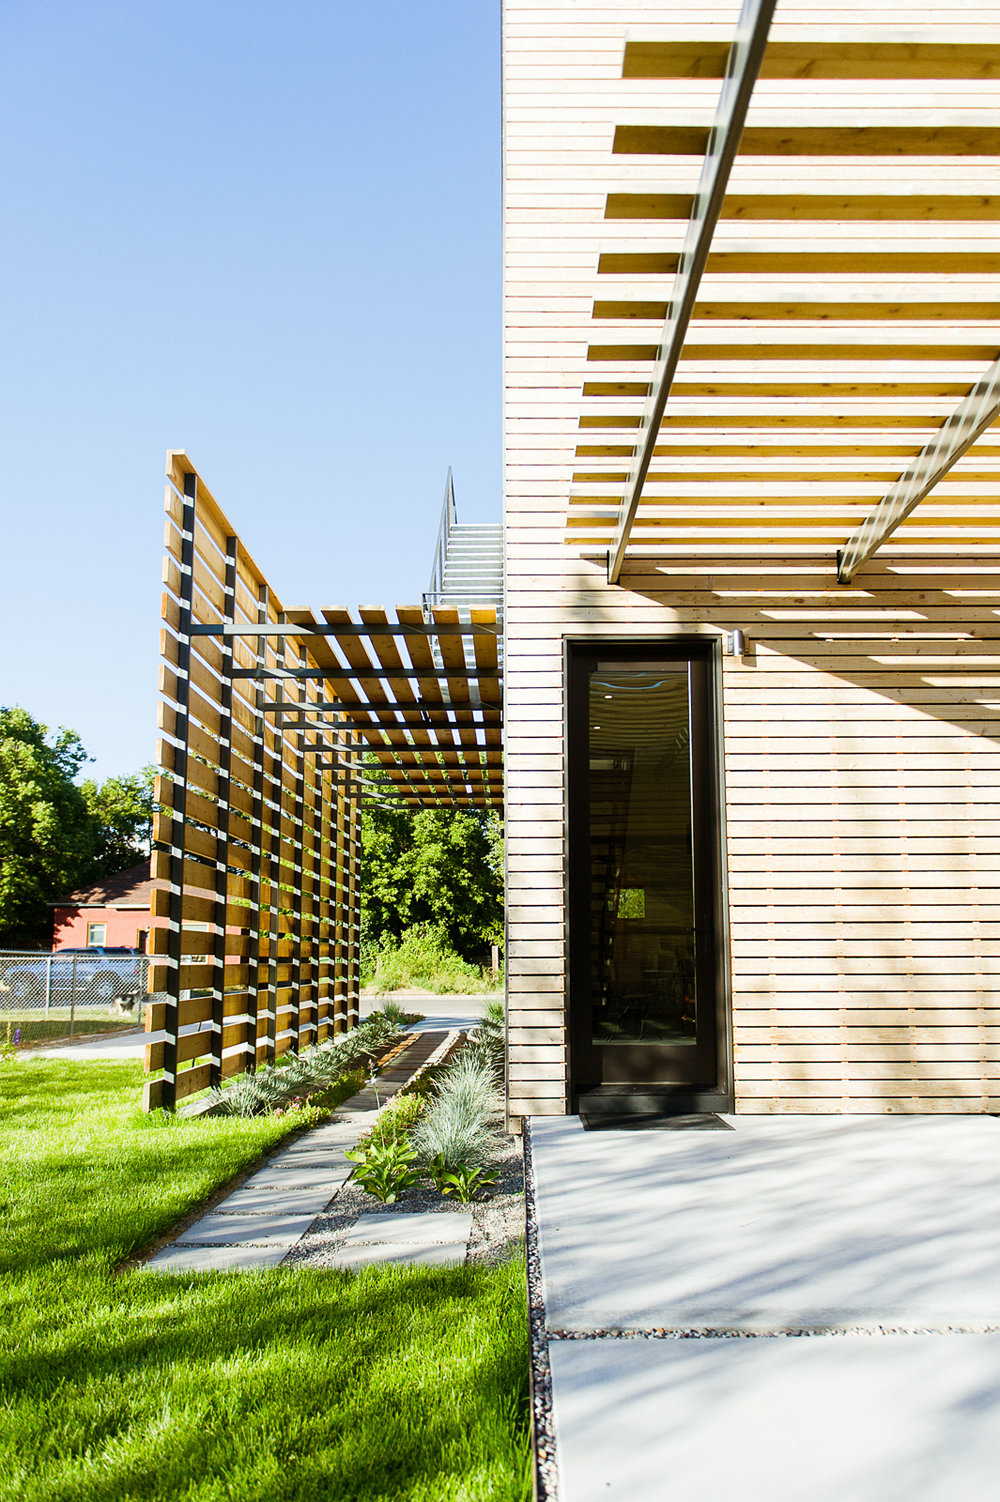 Woodworks-West-Bozeman-Montana-Builder-Cabinetry-Remodel-New-Construction-2545.jpg